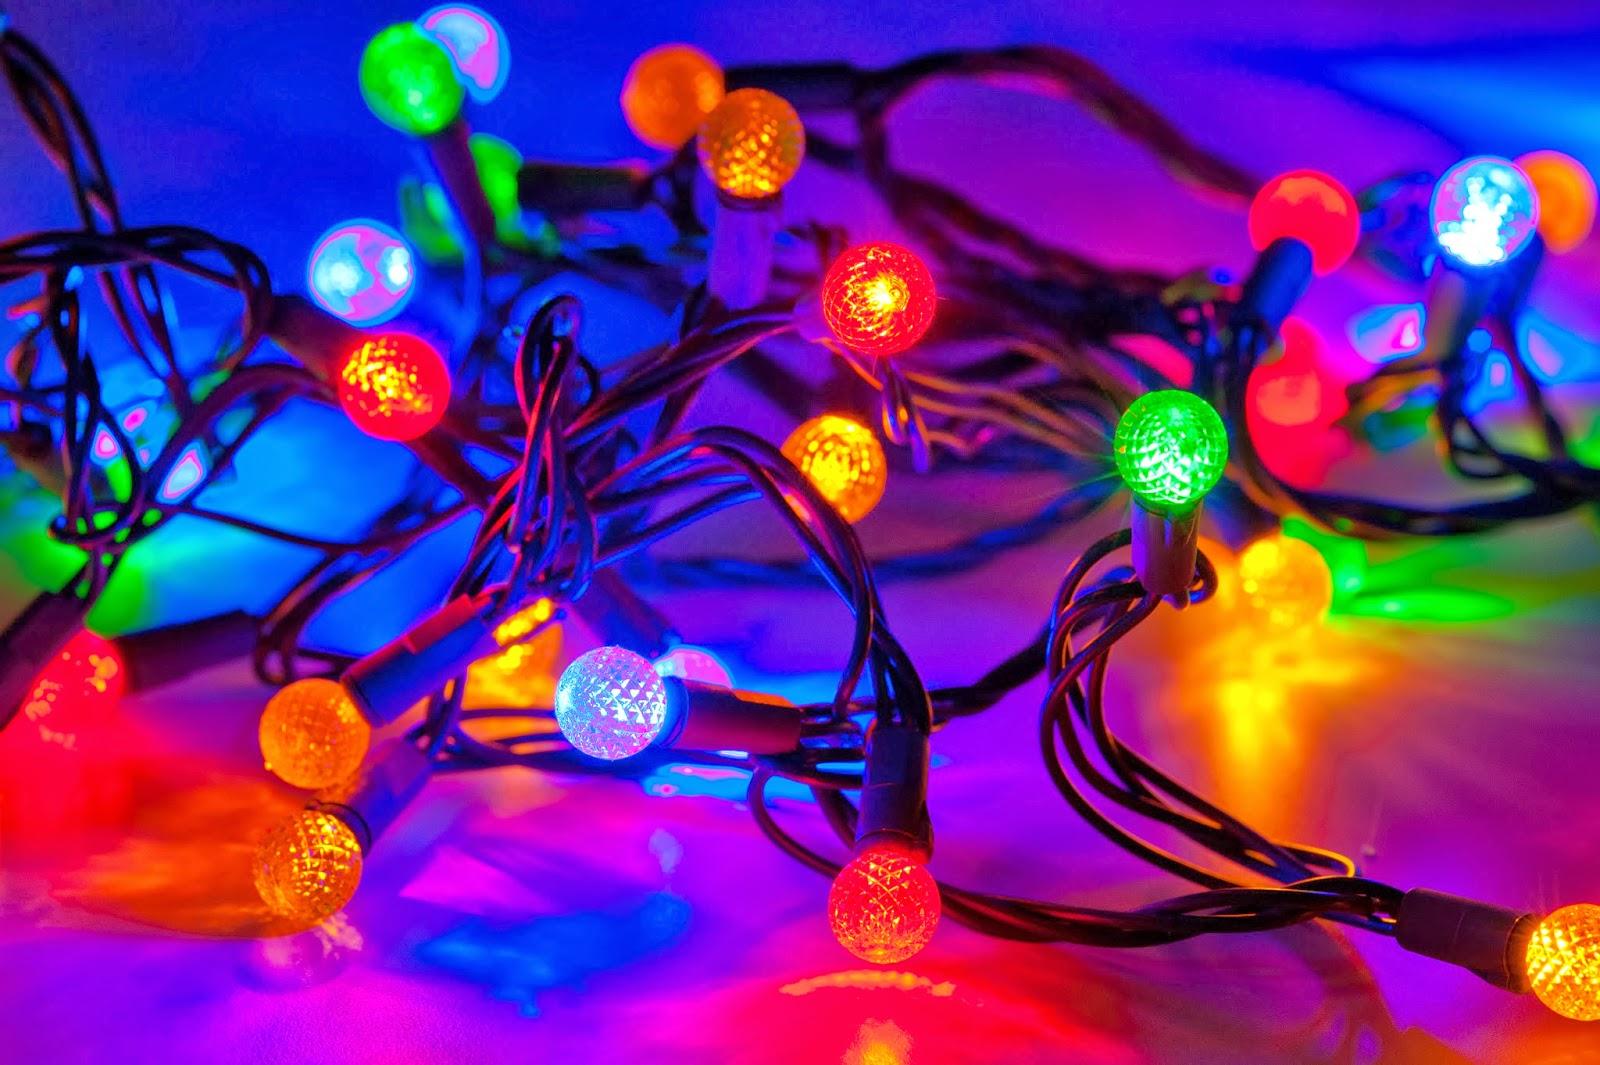 christmaslights christmaslightswallpaper christmaslightson 1600x1065